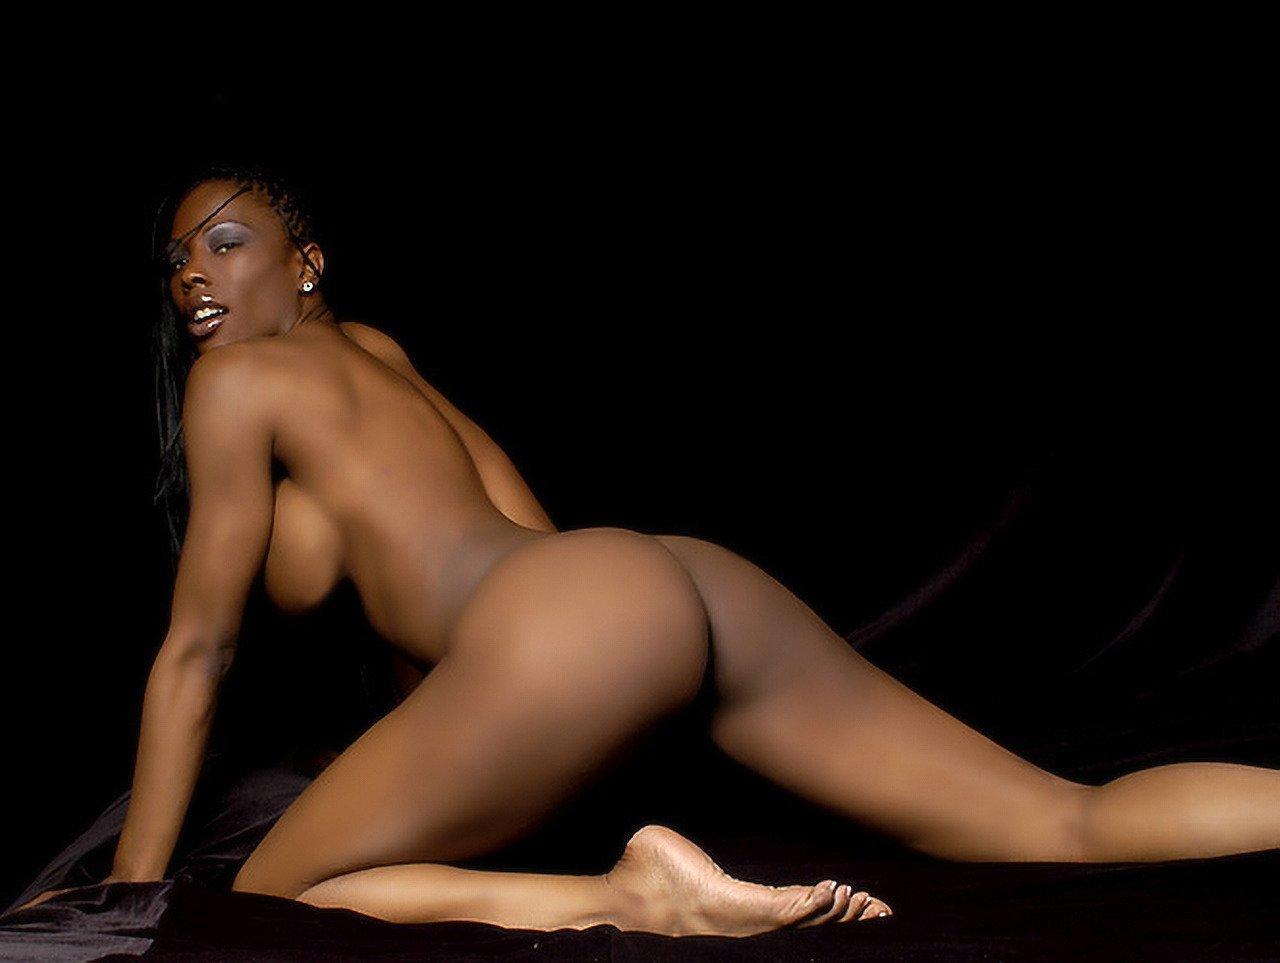 Layla Black Nude